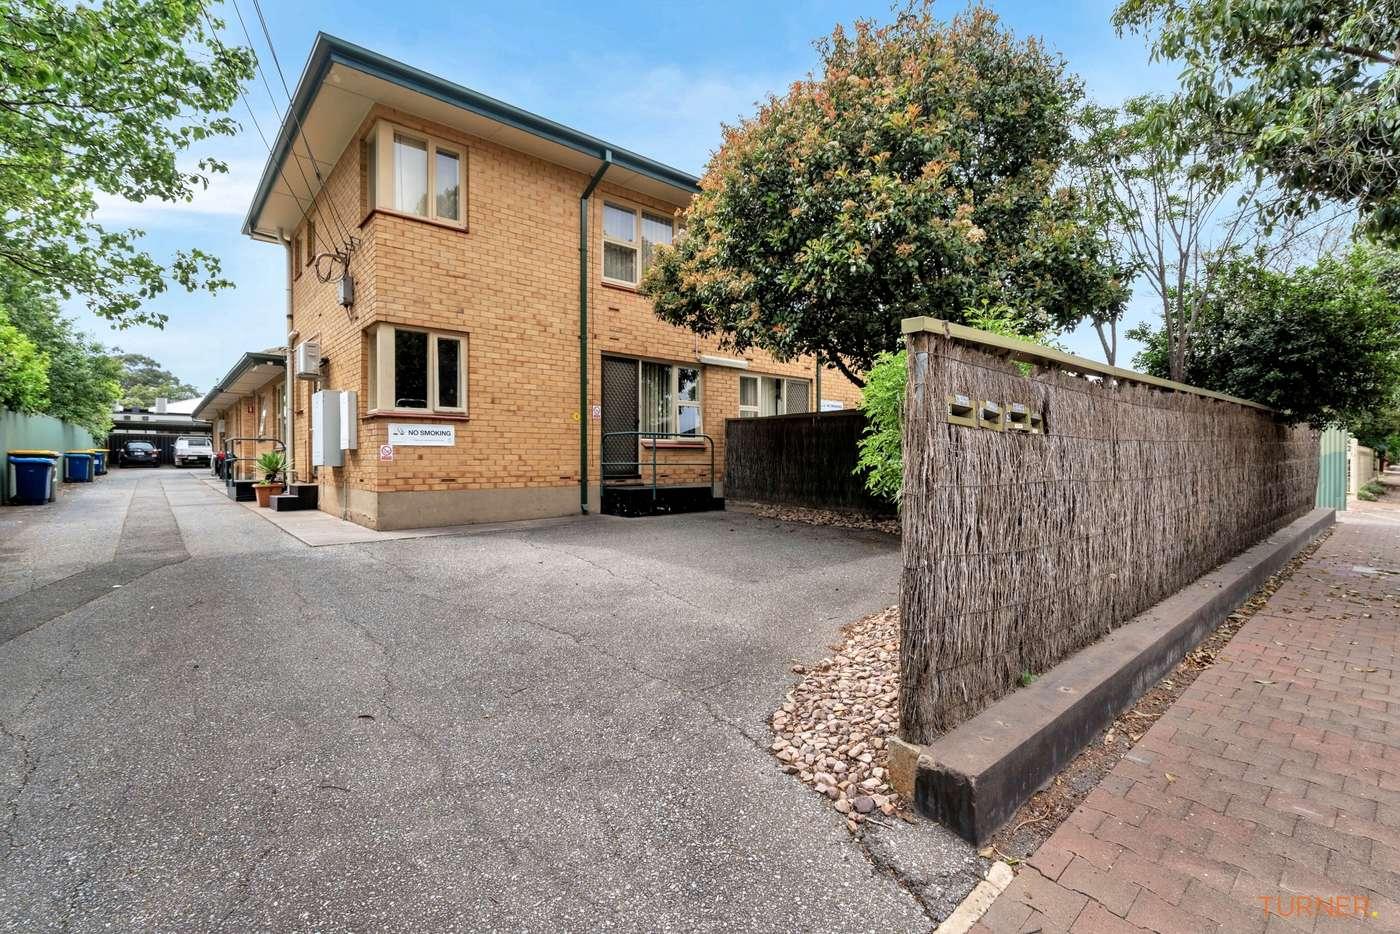 Main view of Homely unit listing, 1/3 Seaview Street, Fullarton SA 5063